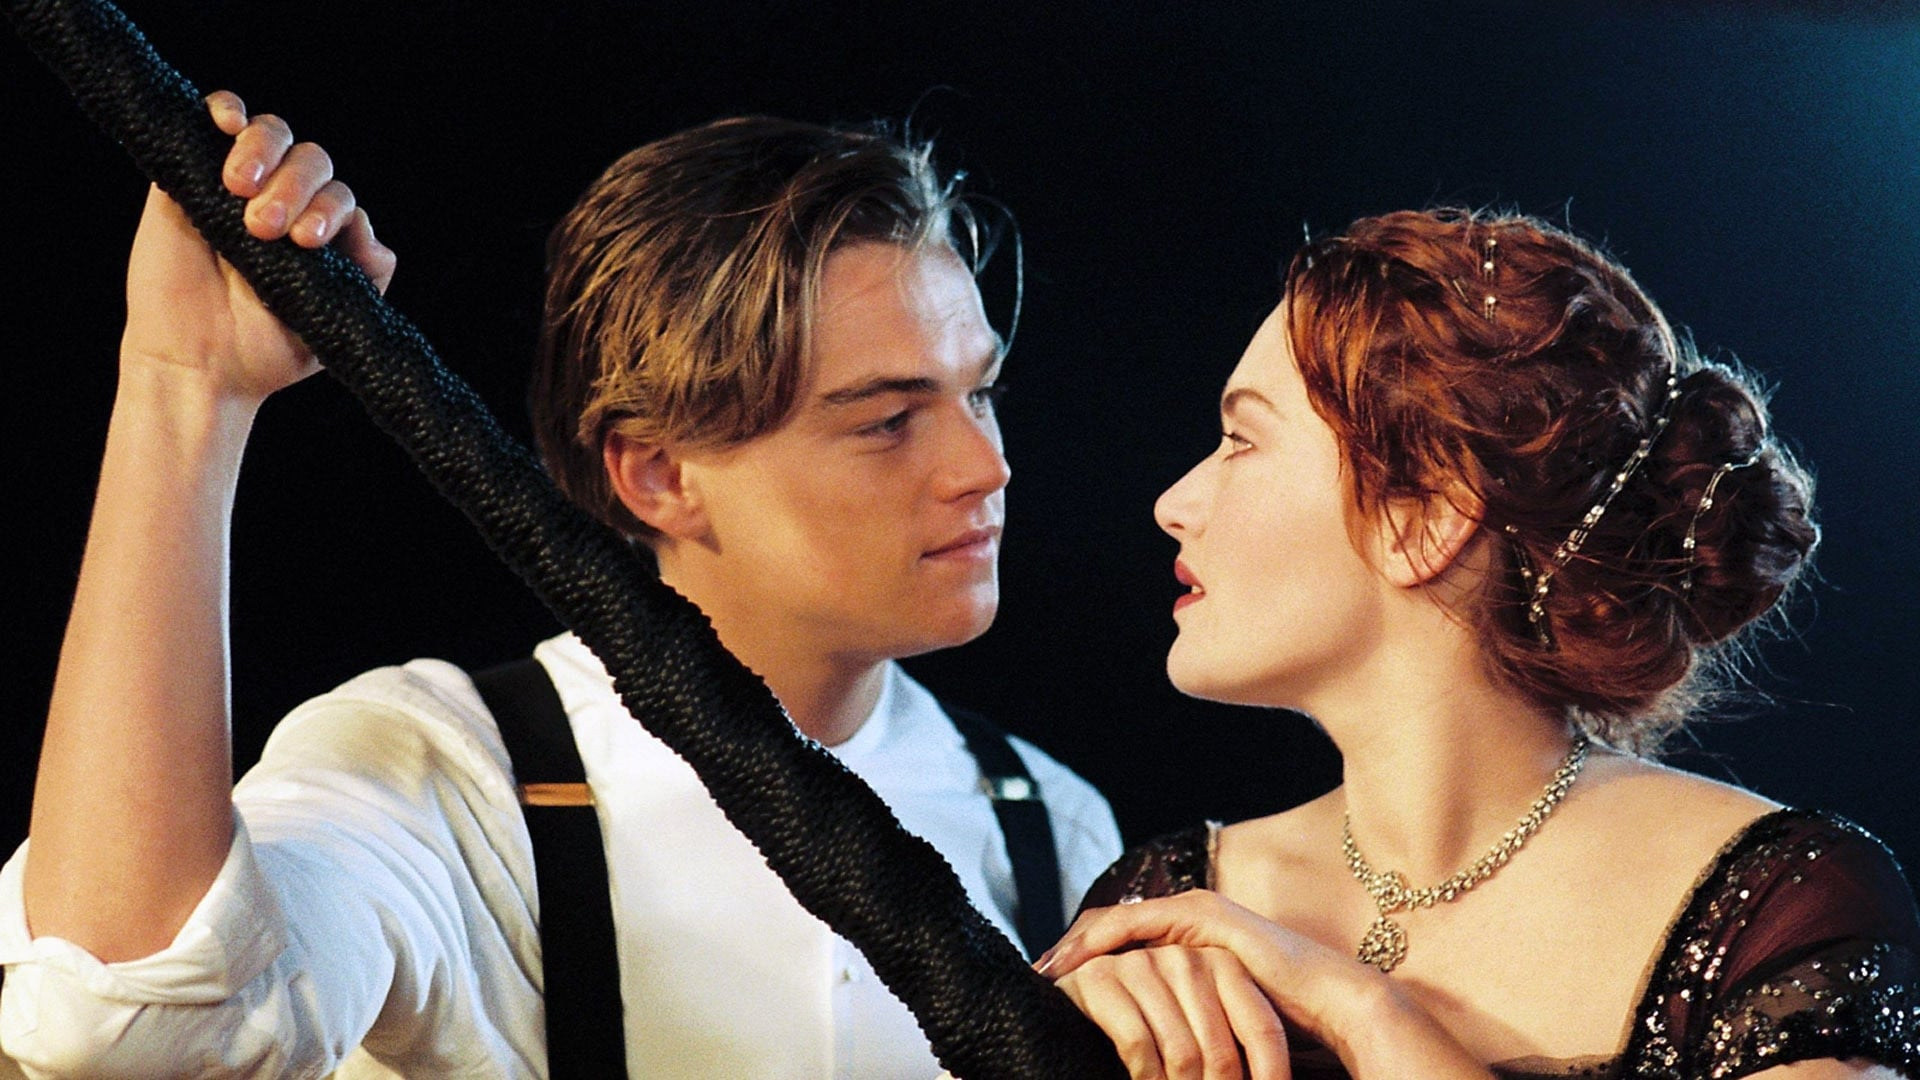 Ver Titanic Película Subtitulada Online Completa Hd Gratis